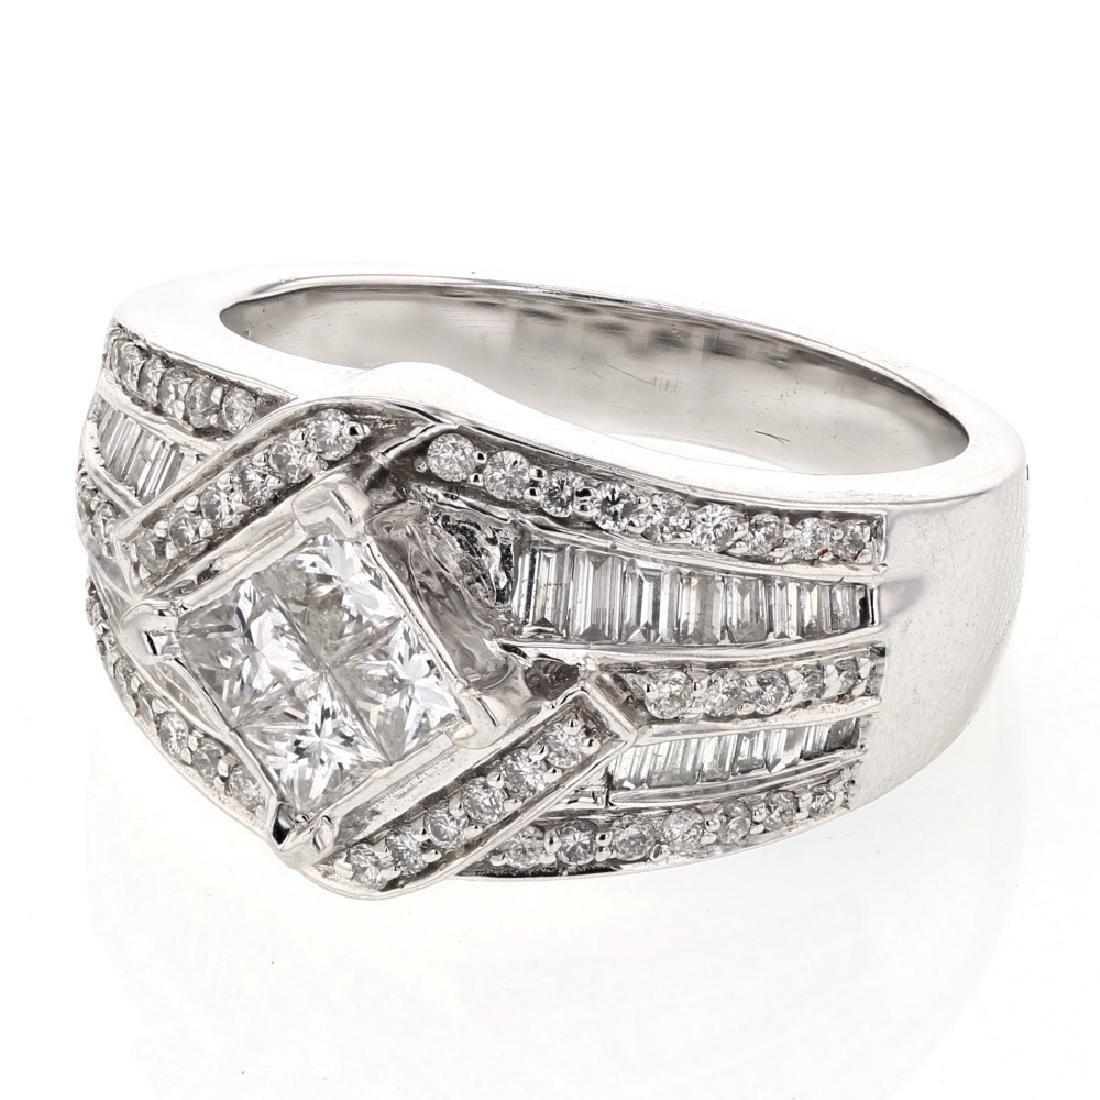 Cocktail Diamond Ring with Milgrain in 14K White Gold -